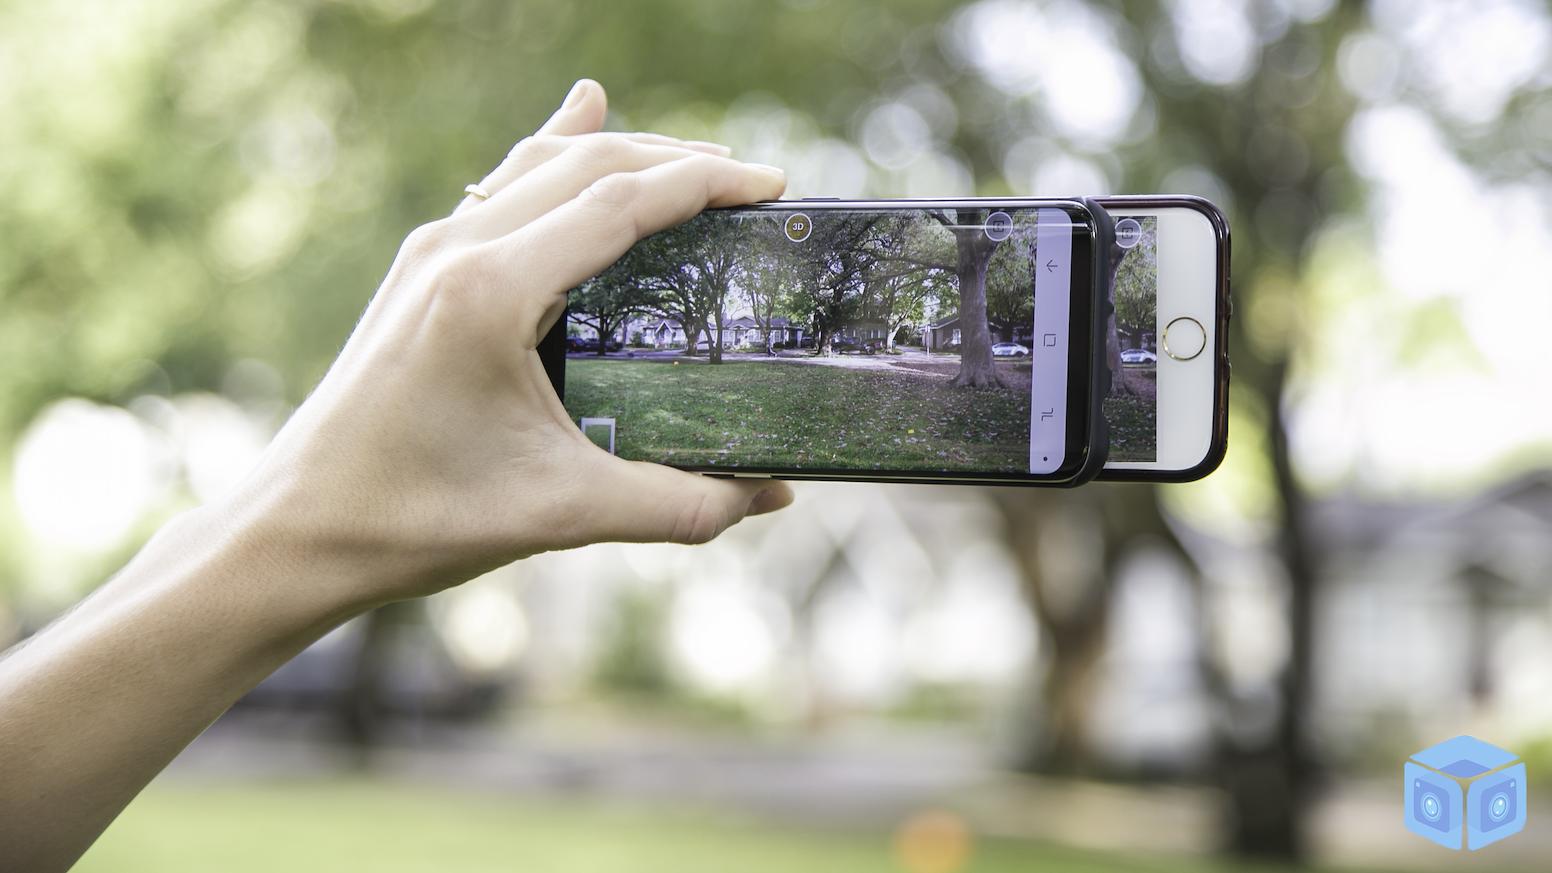 CAMARADA: The First True 3D Camera App by Aimfire Inc